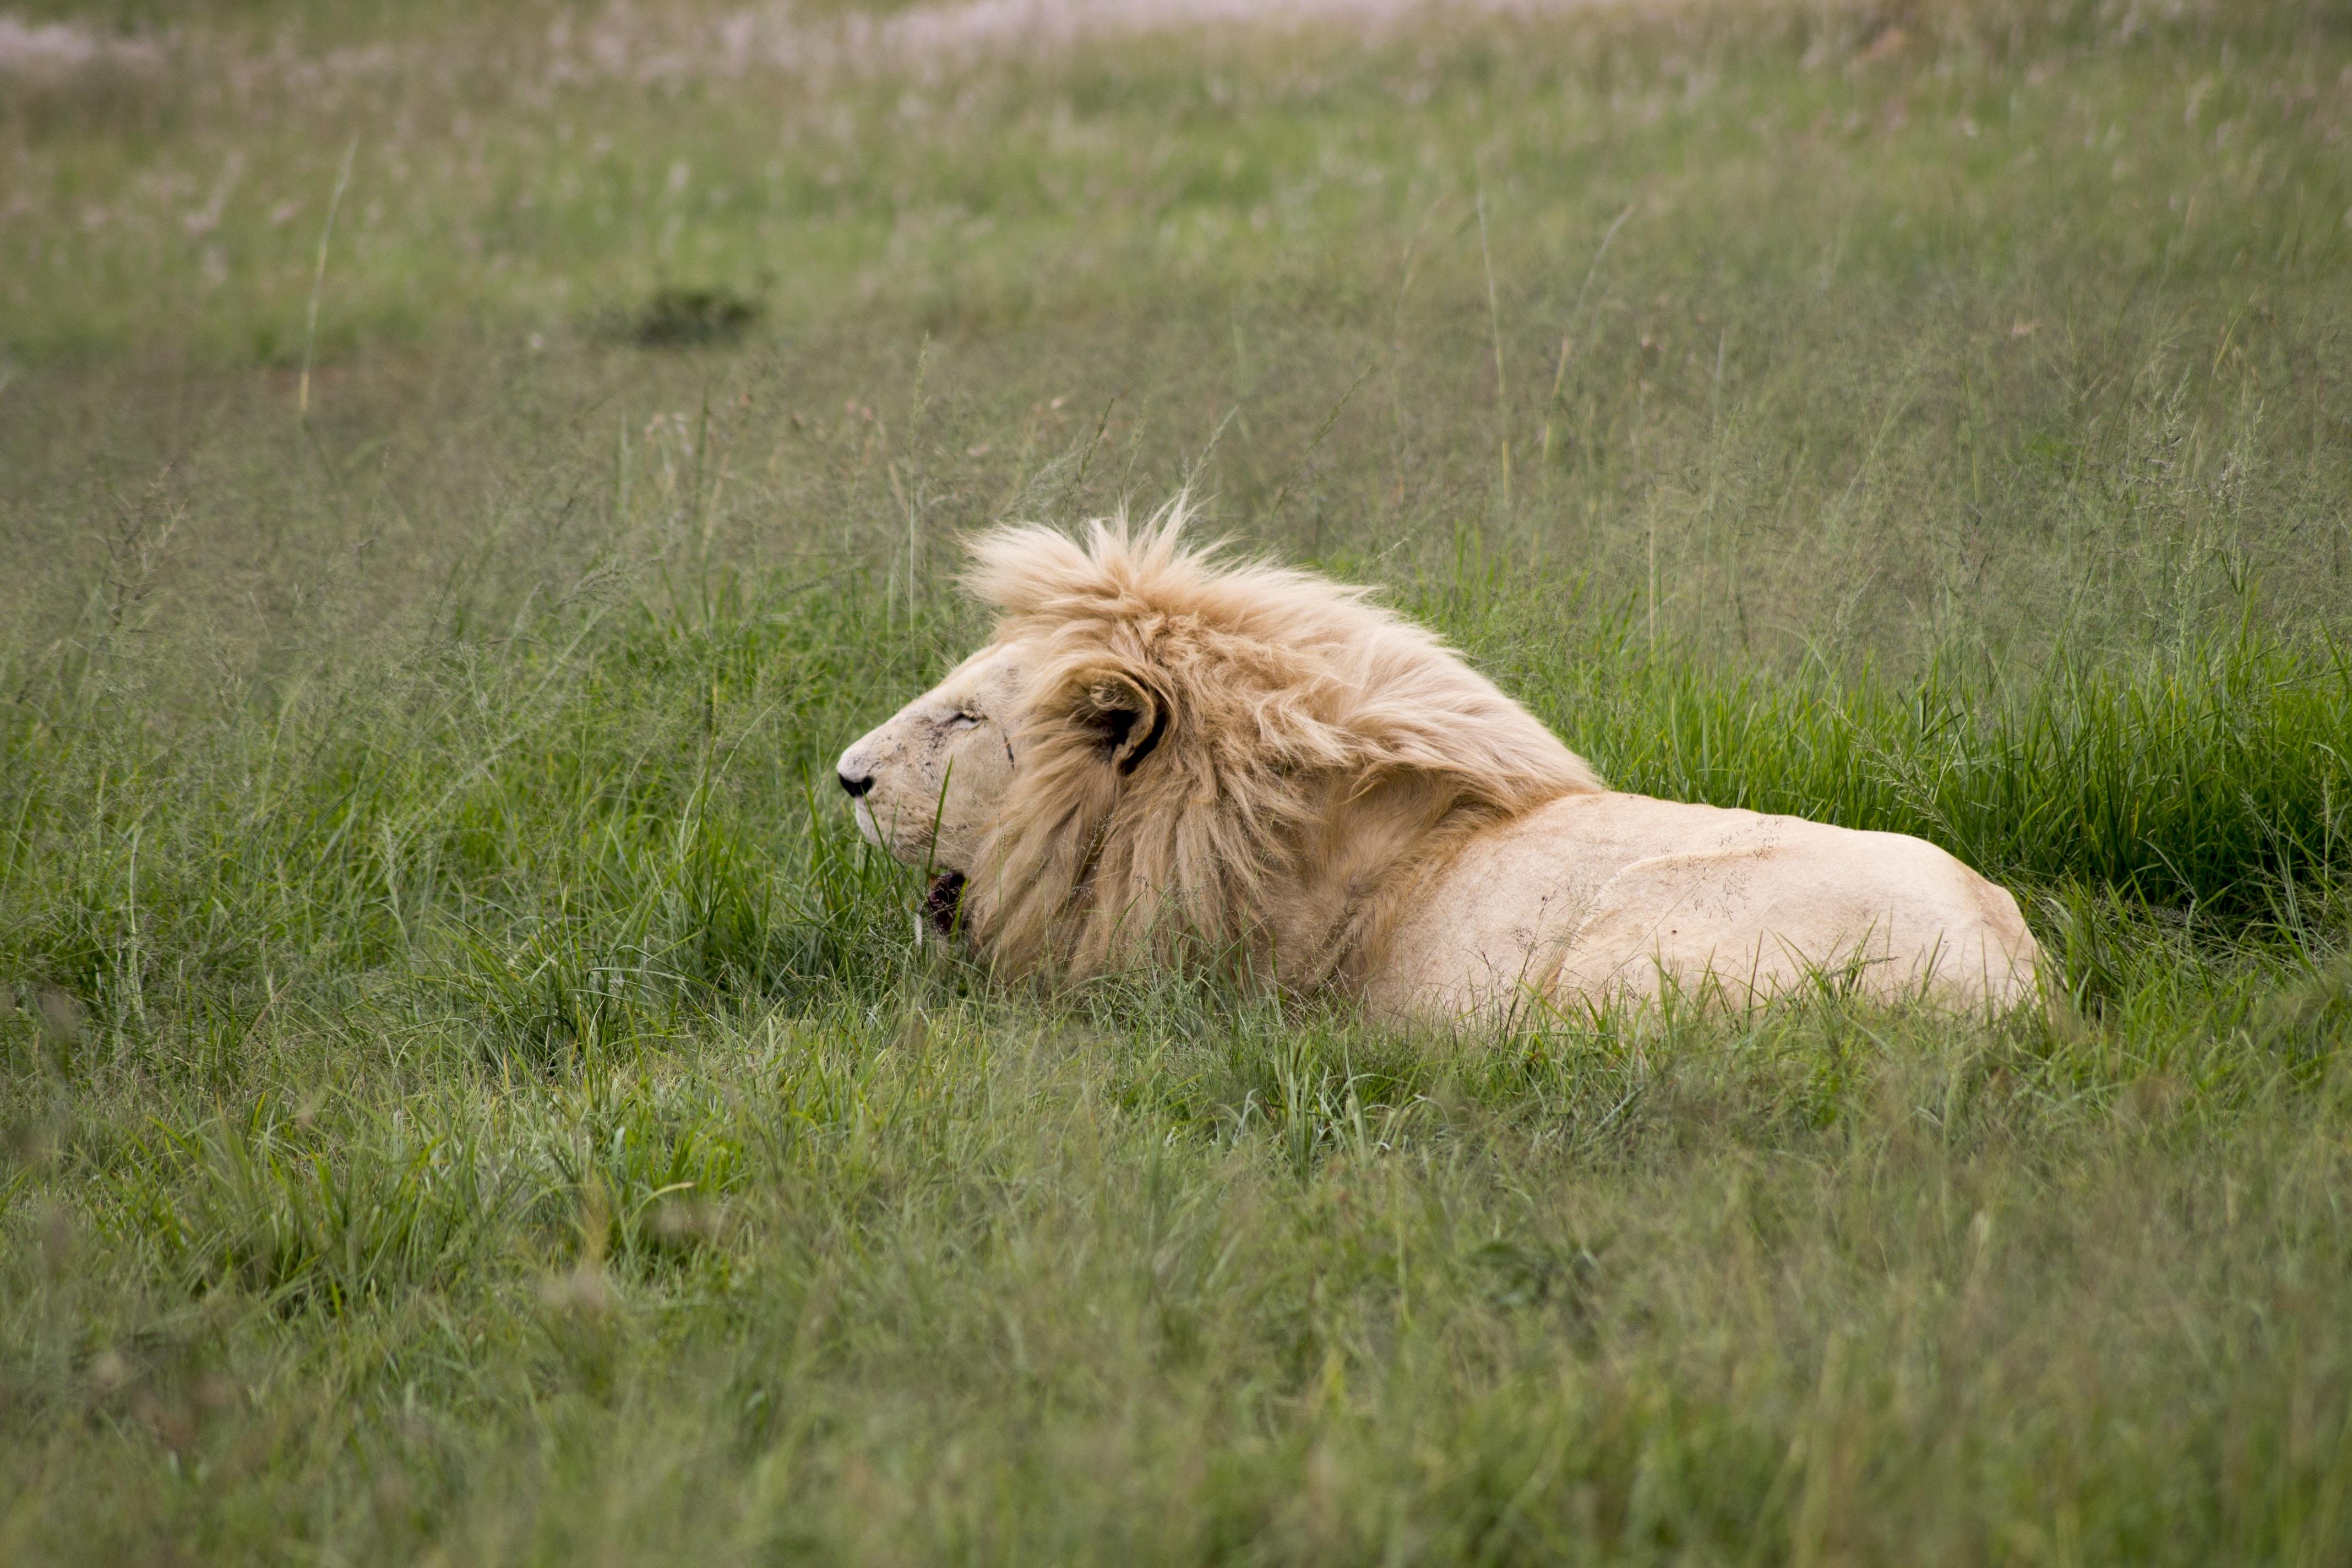 brown lion lying on green grass